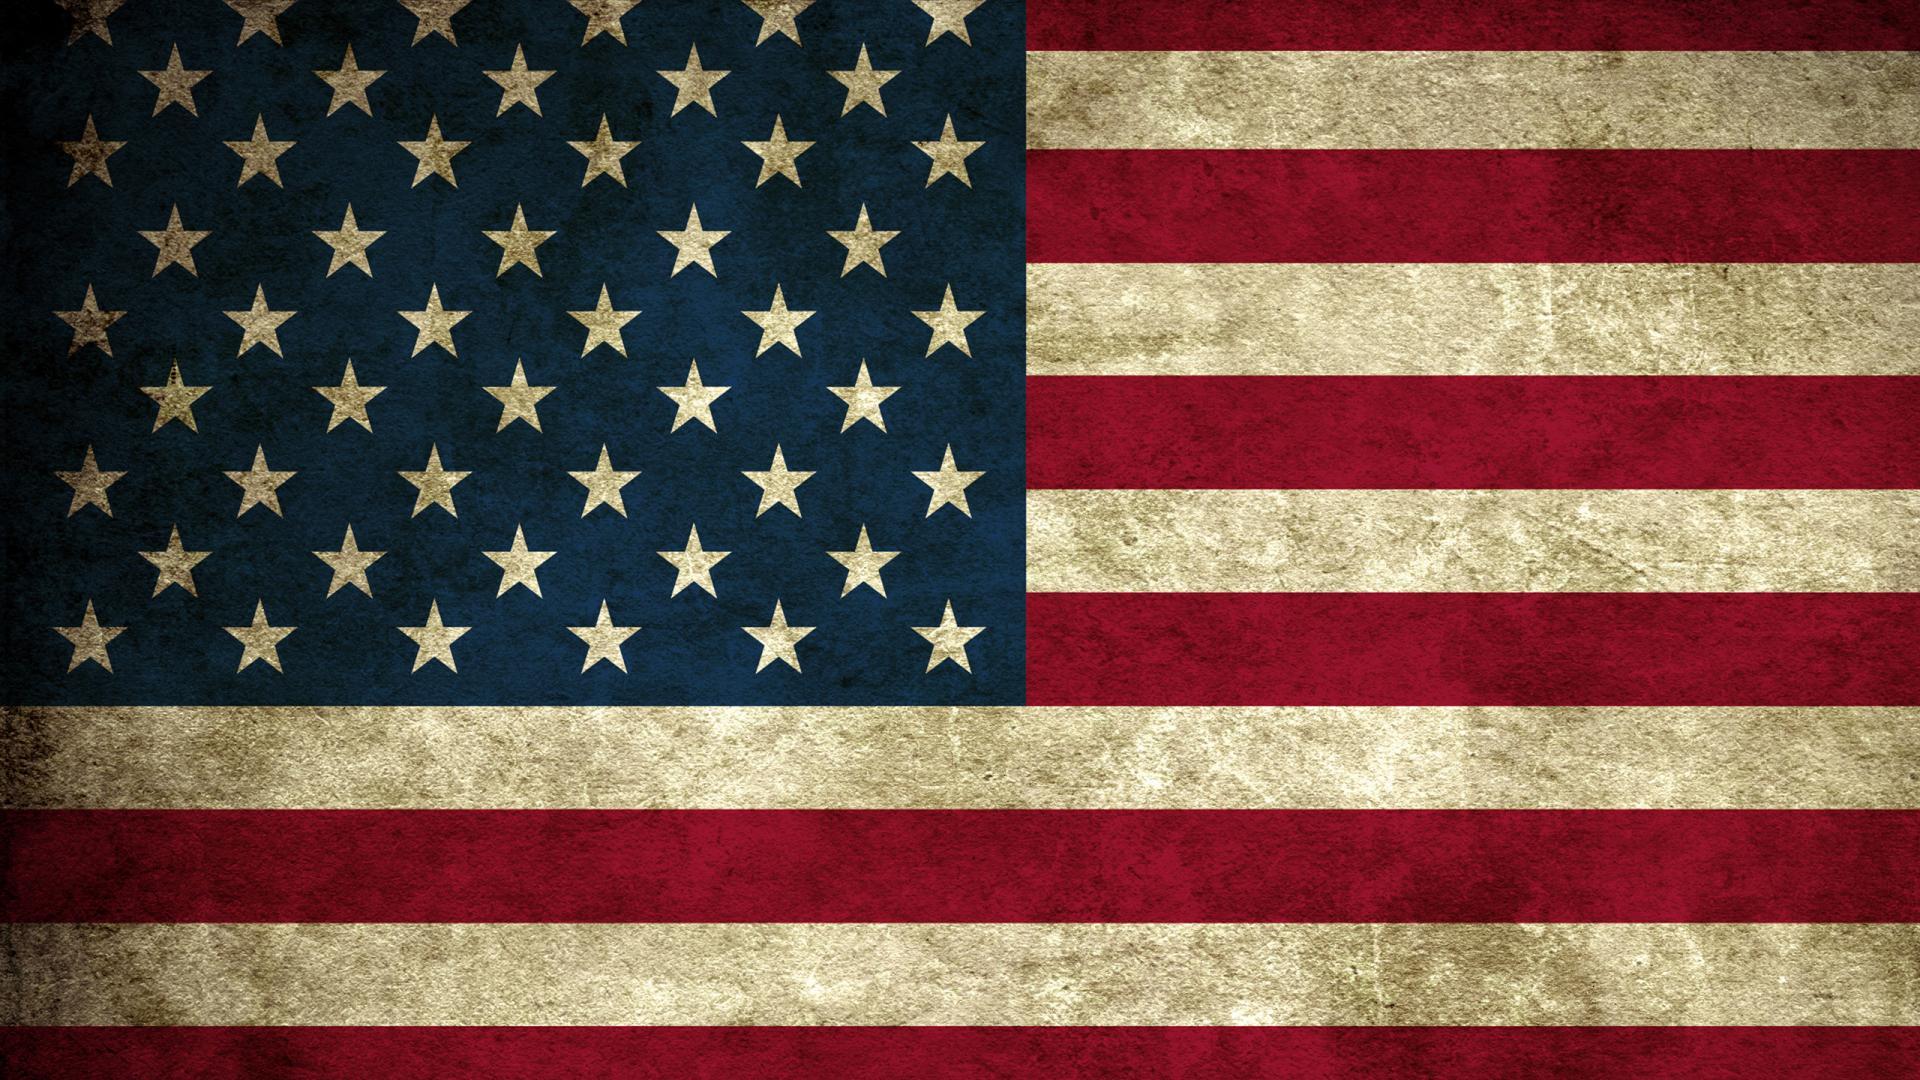 find usa flag wallpaper hd wallpapers usa flag wallpaper hd 1920x1080